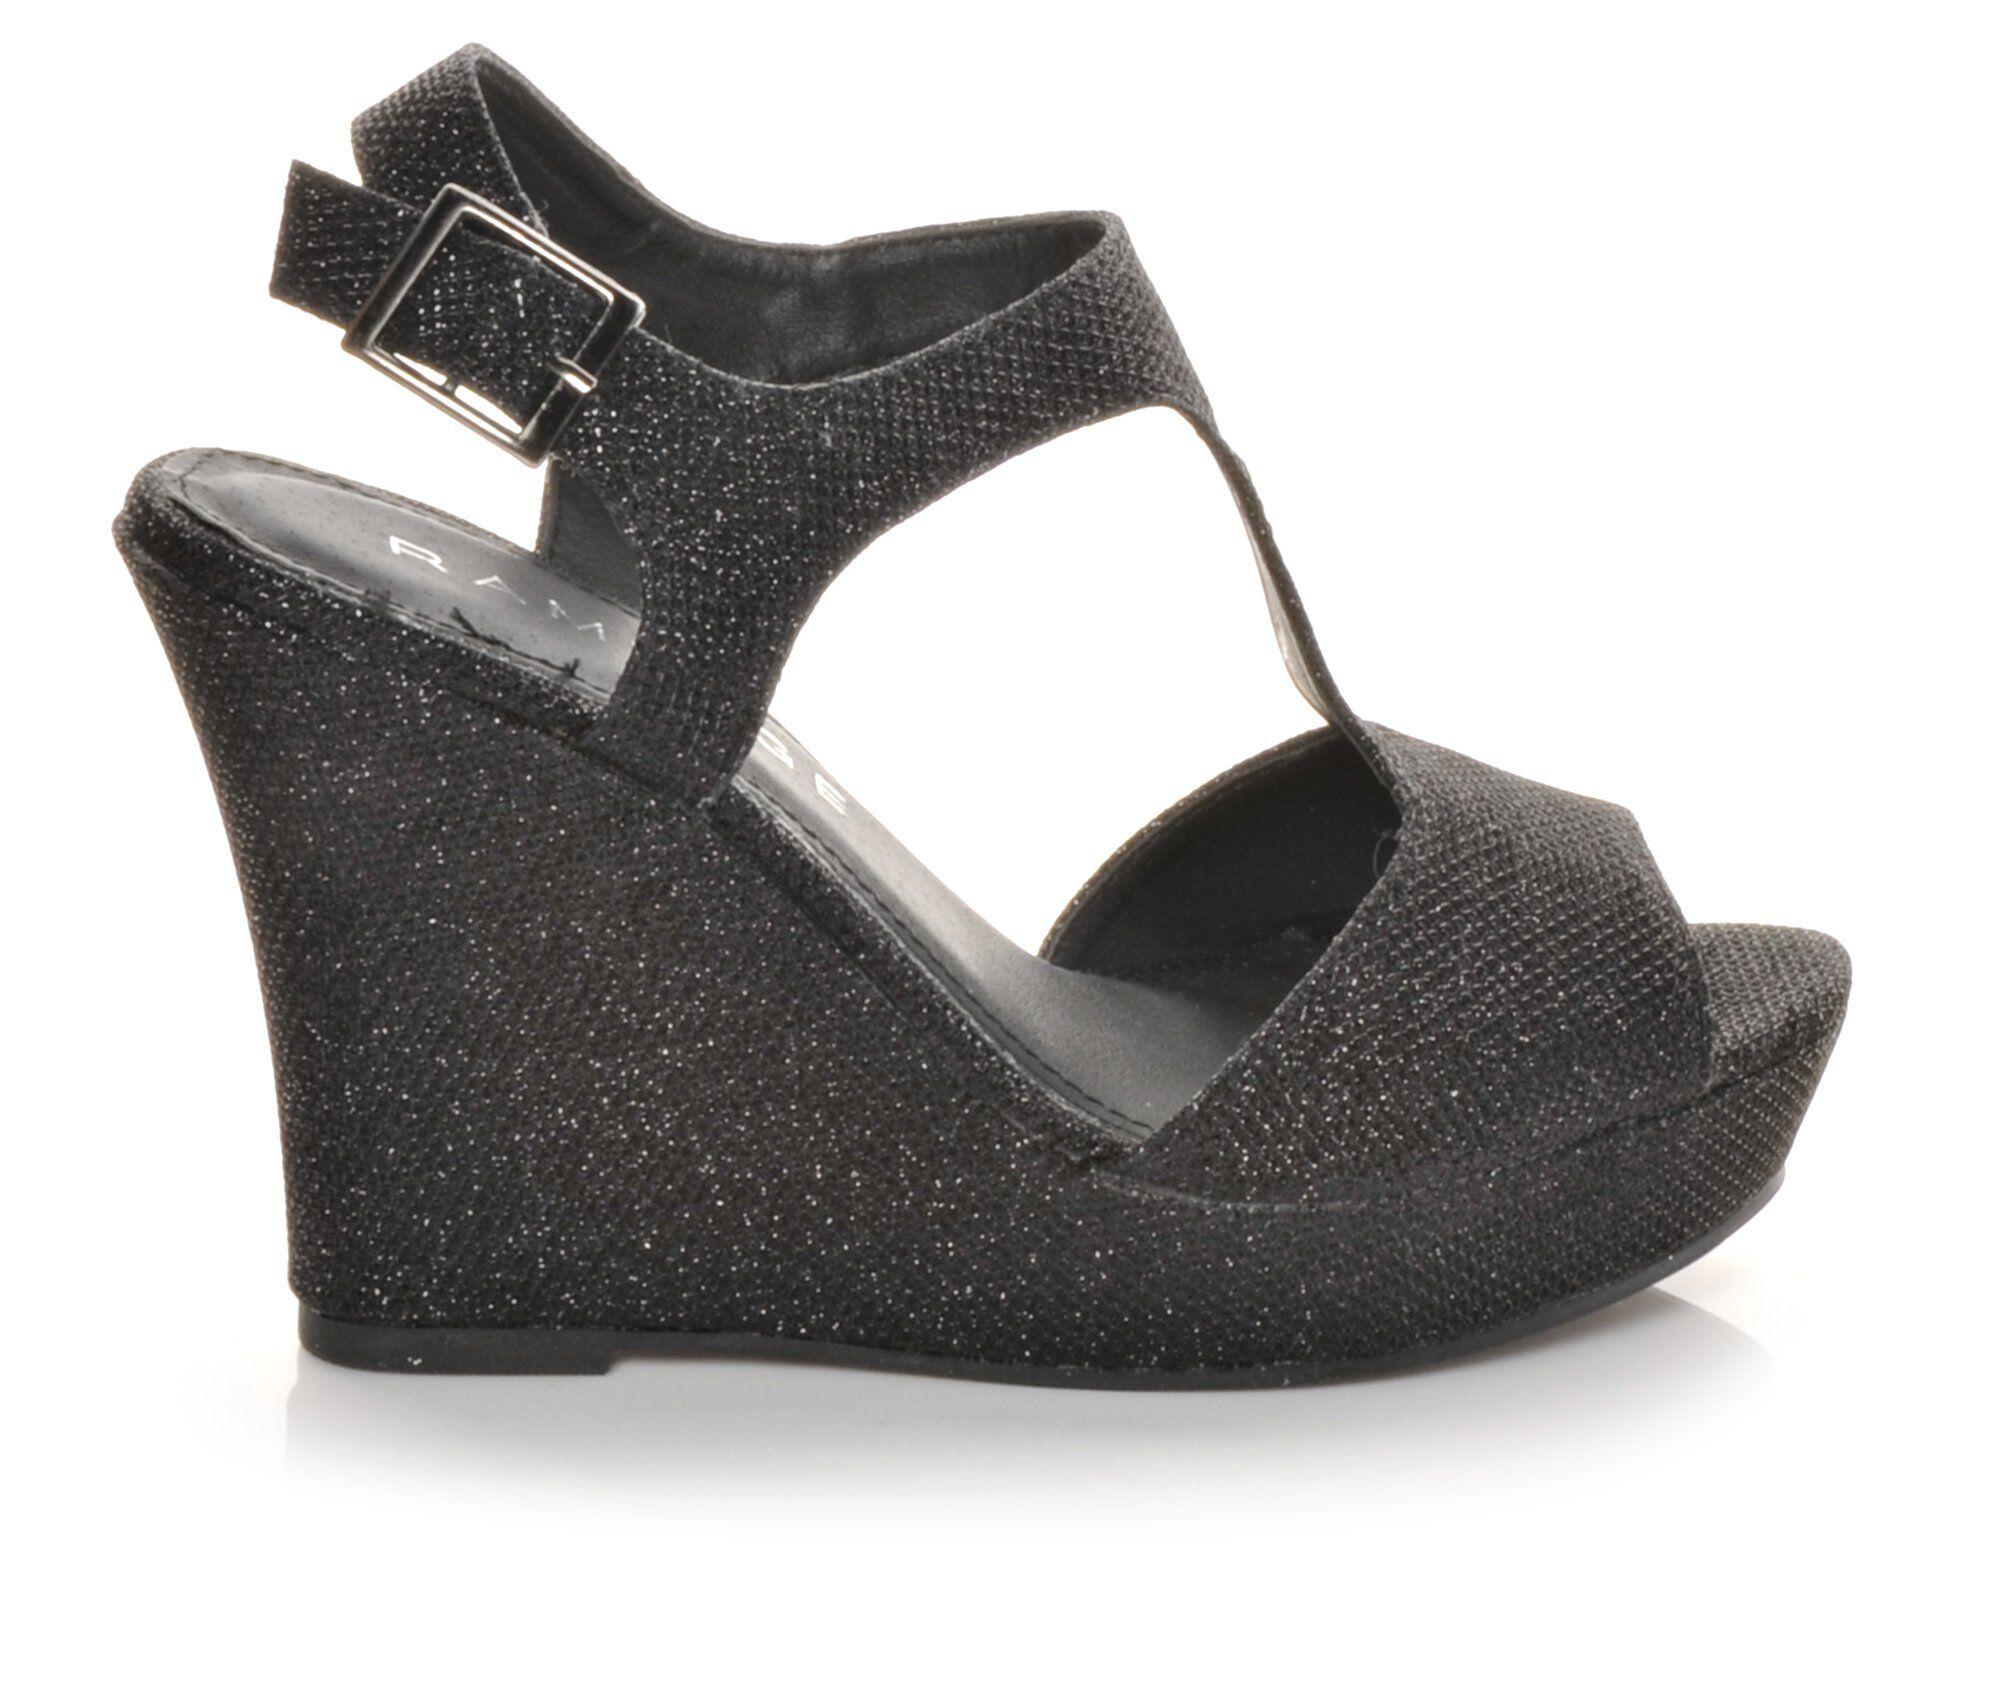 Women's Rampage Candelas Wedge Dress Sandals Black Glitter